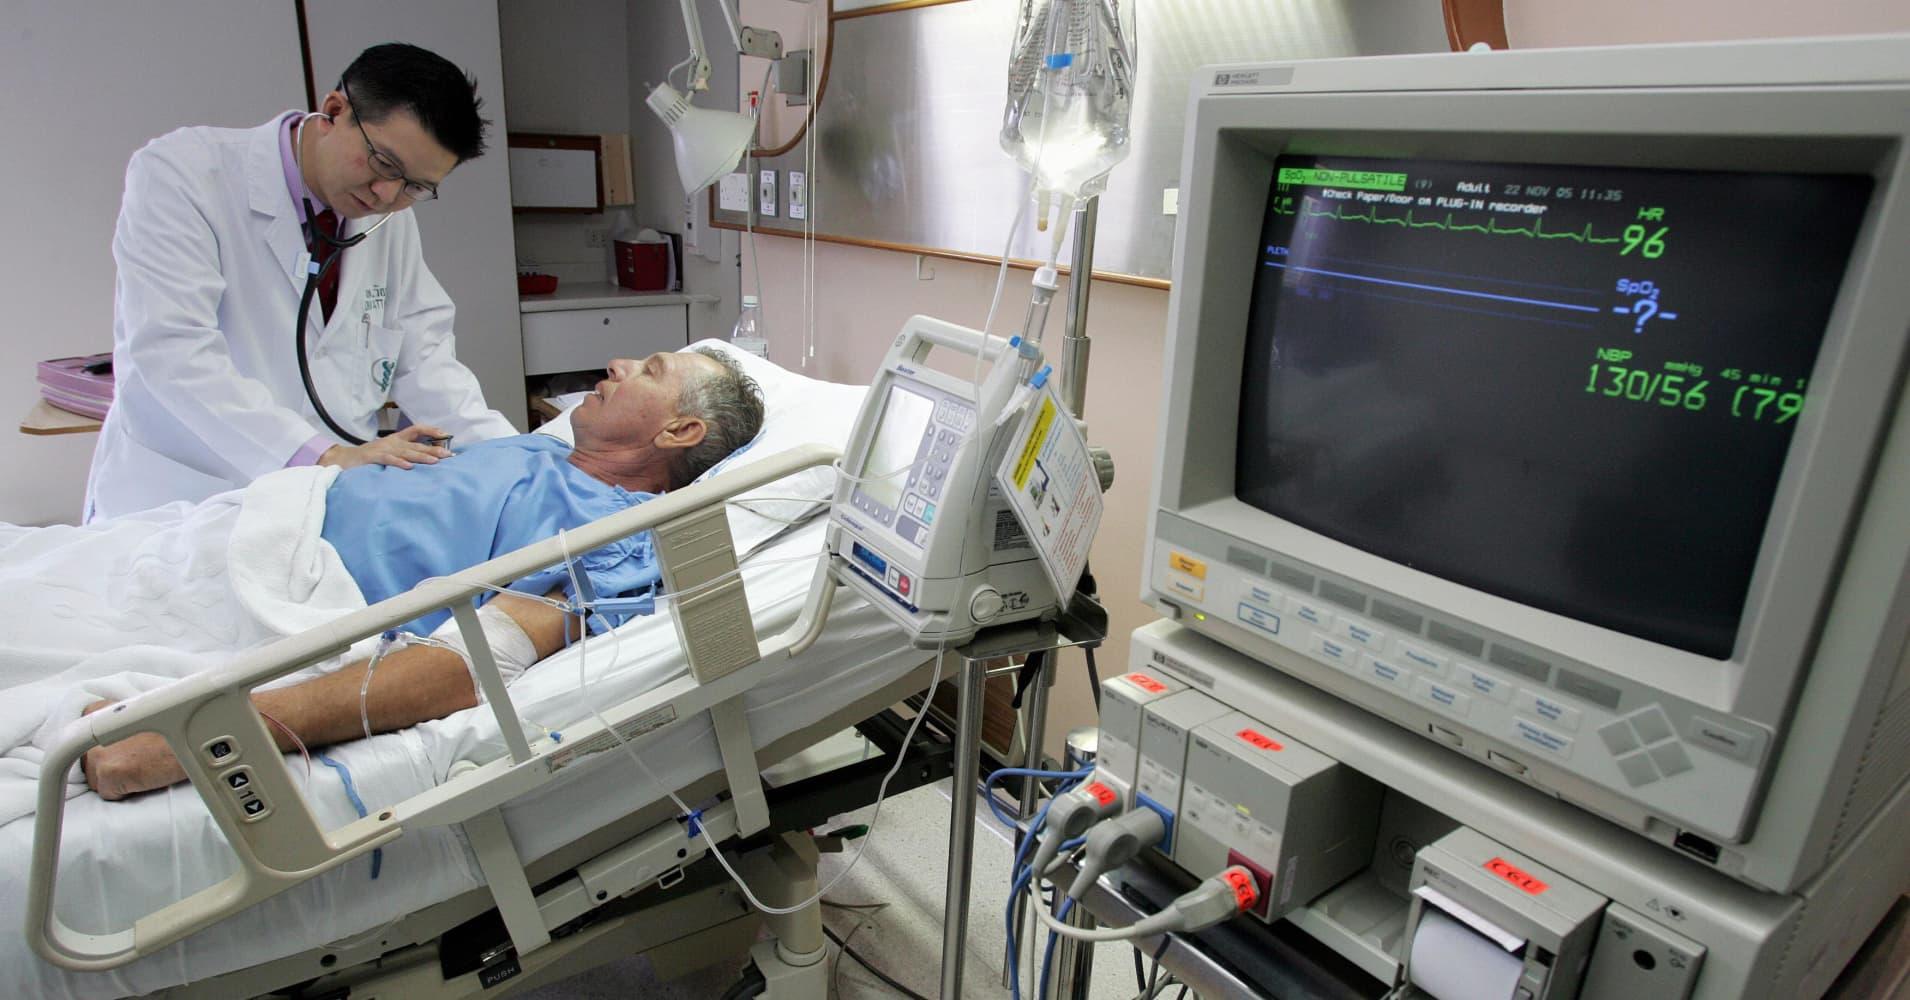 hai cardiologist Wattanaphol Phipatananunth (L) checks a Norwegian patient at cardiology ward of Bumrungrad International Hospital in Bangkok